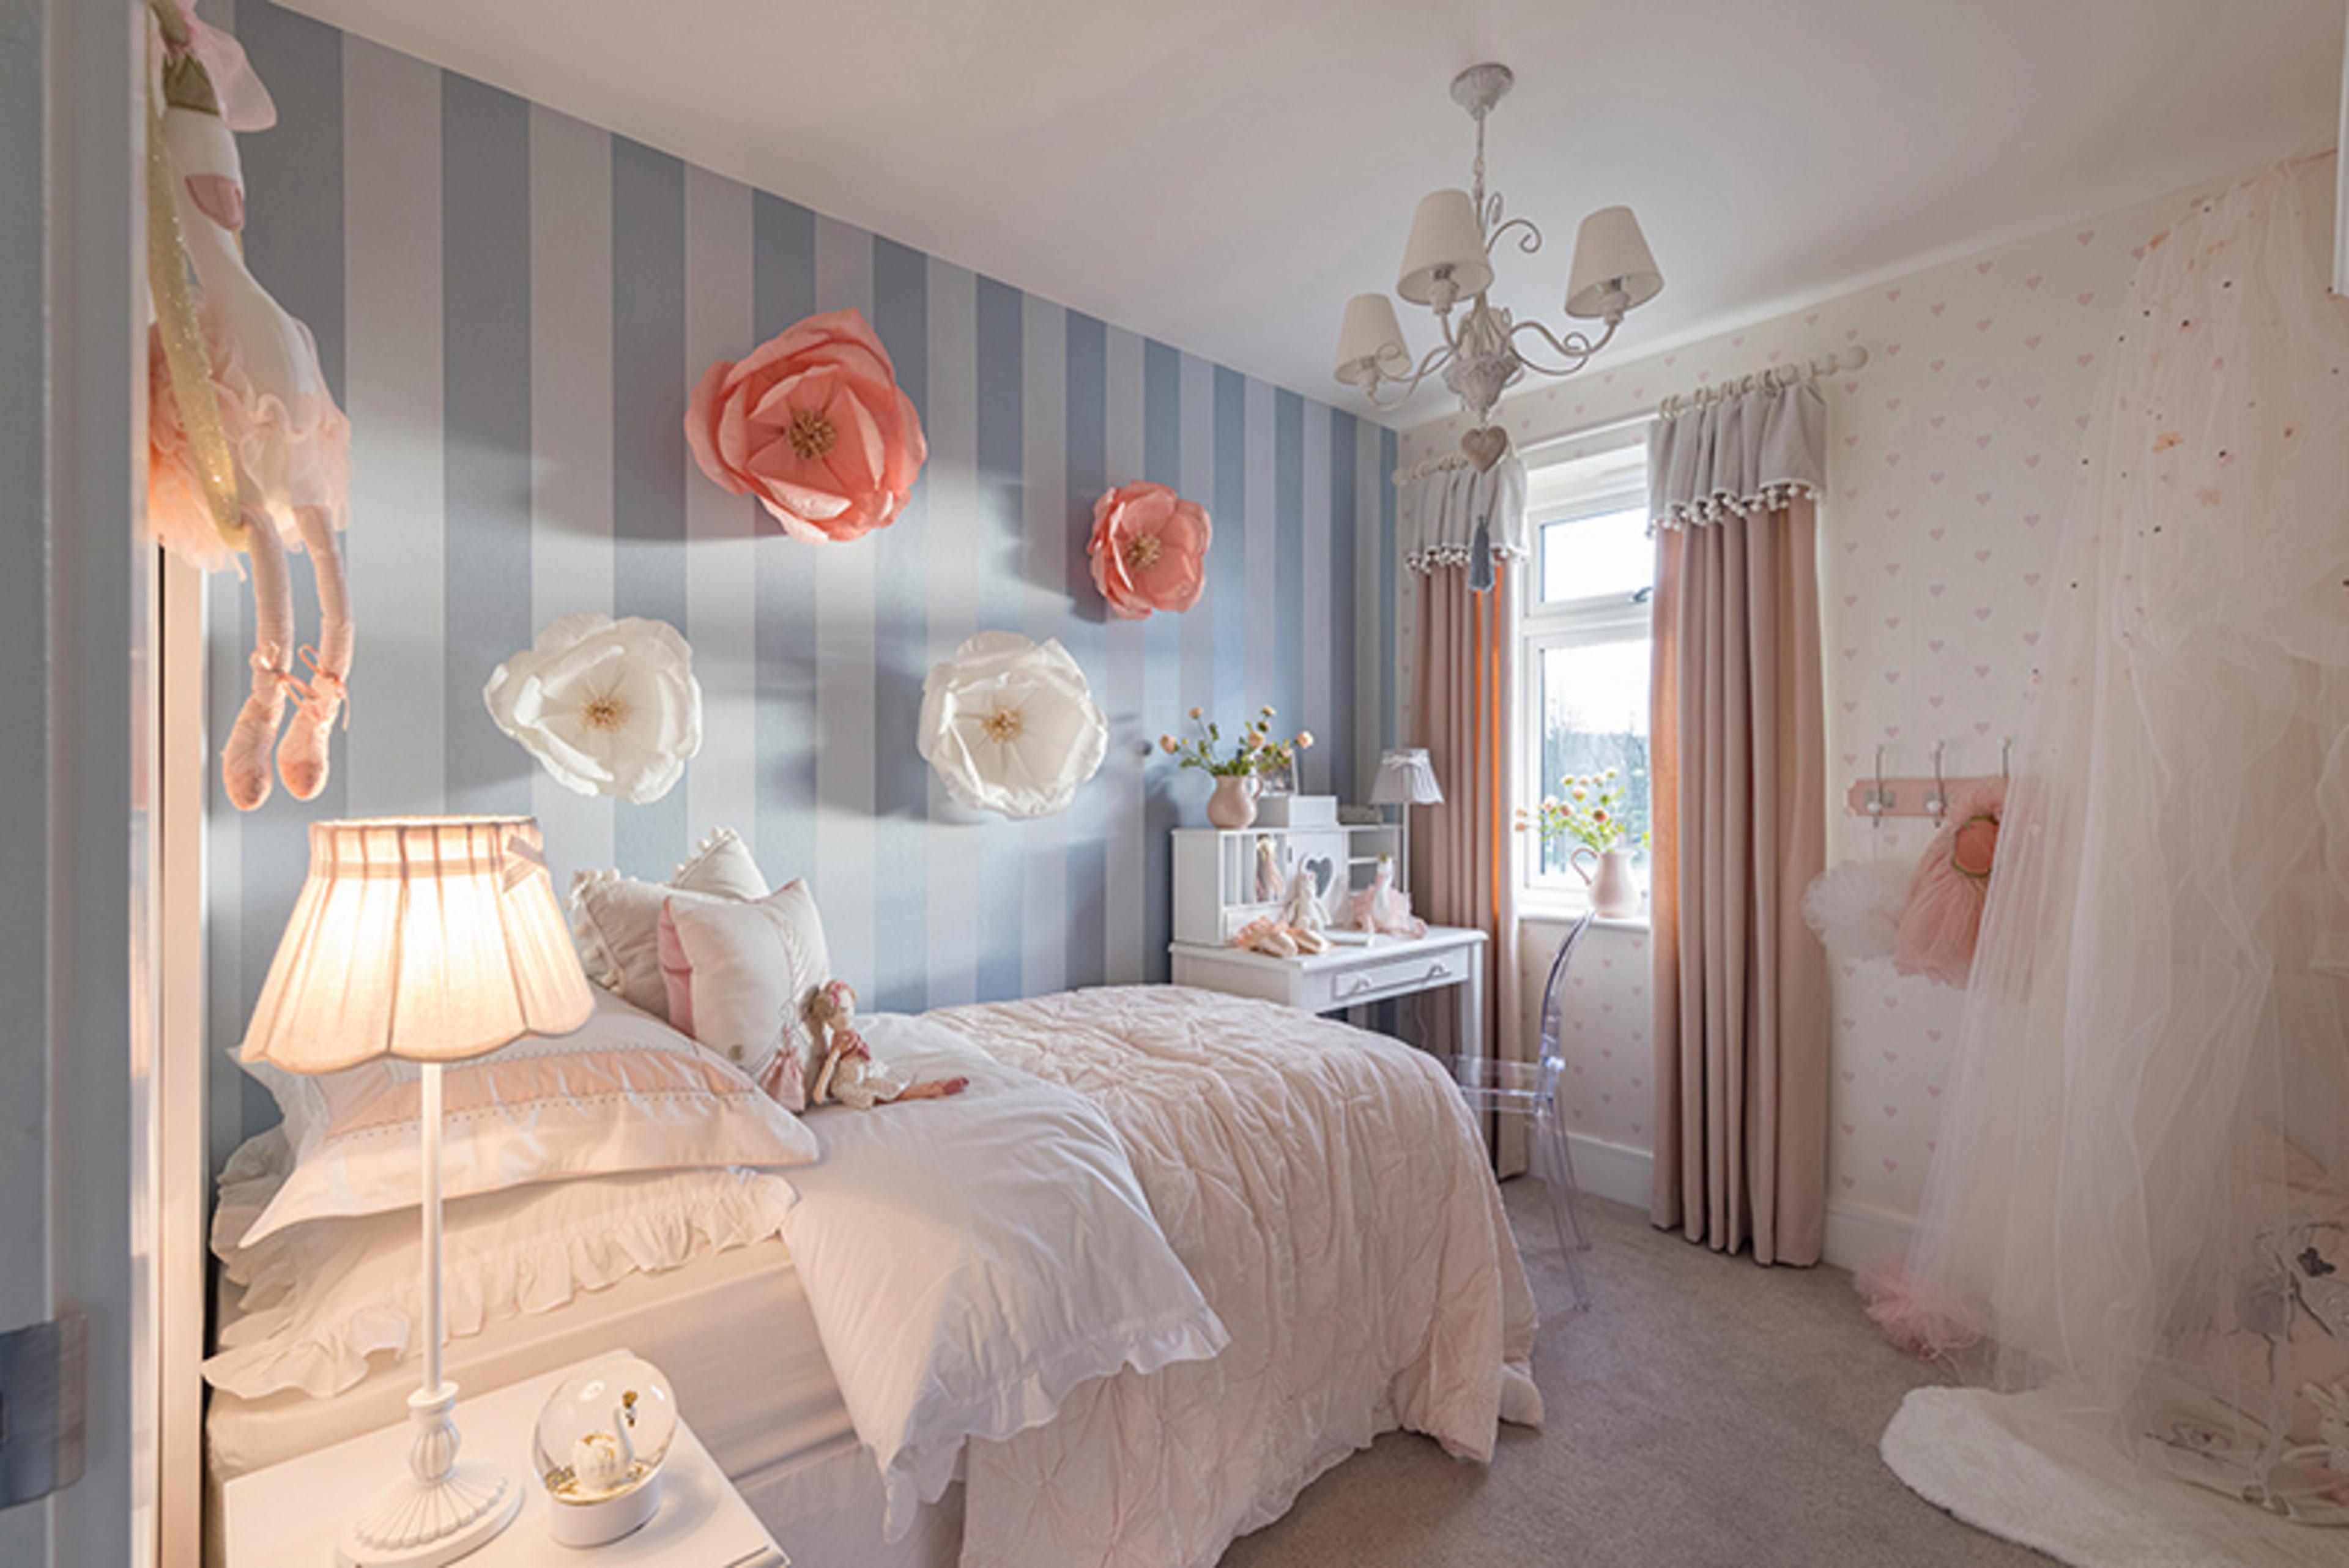 watling-grange-harrogate-calder-3-bed-home-single-bedroom-1